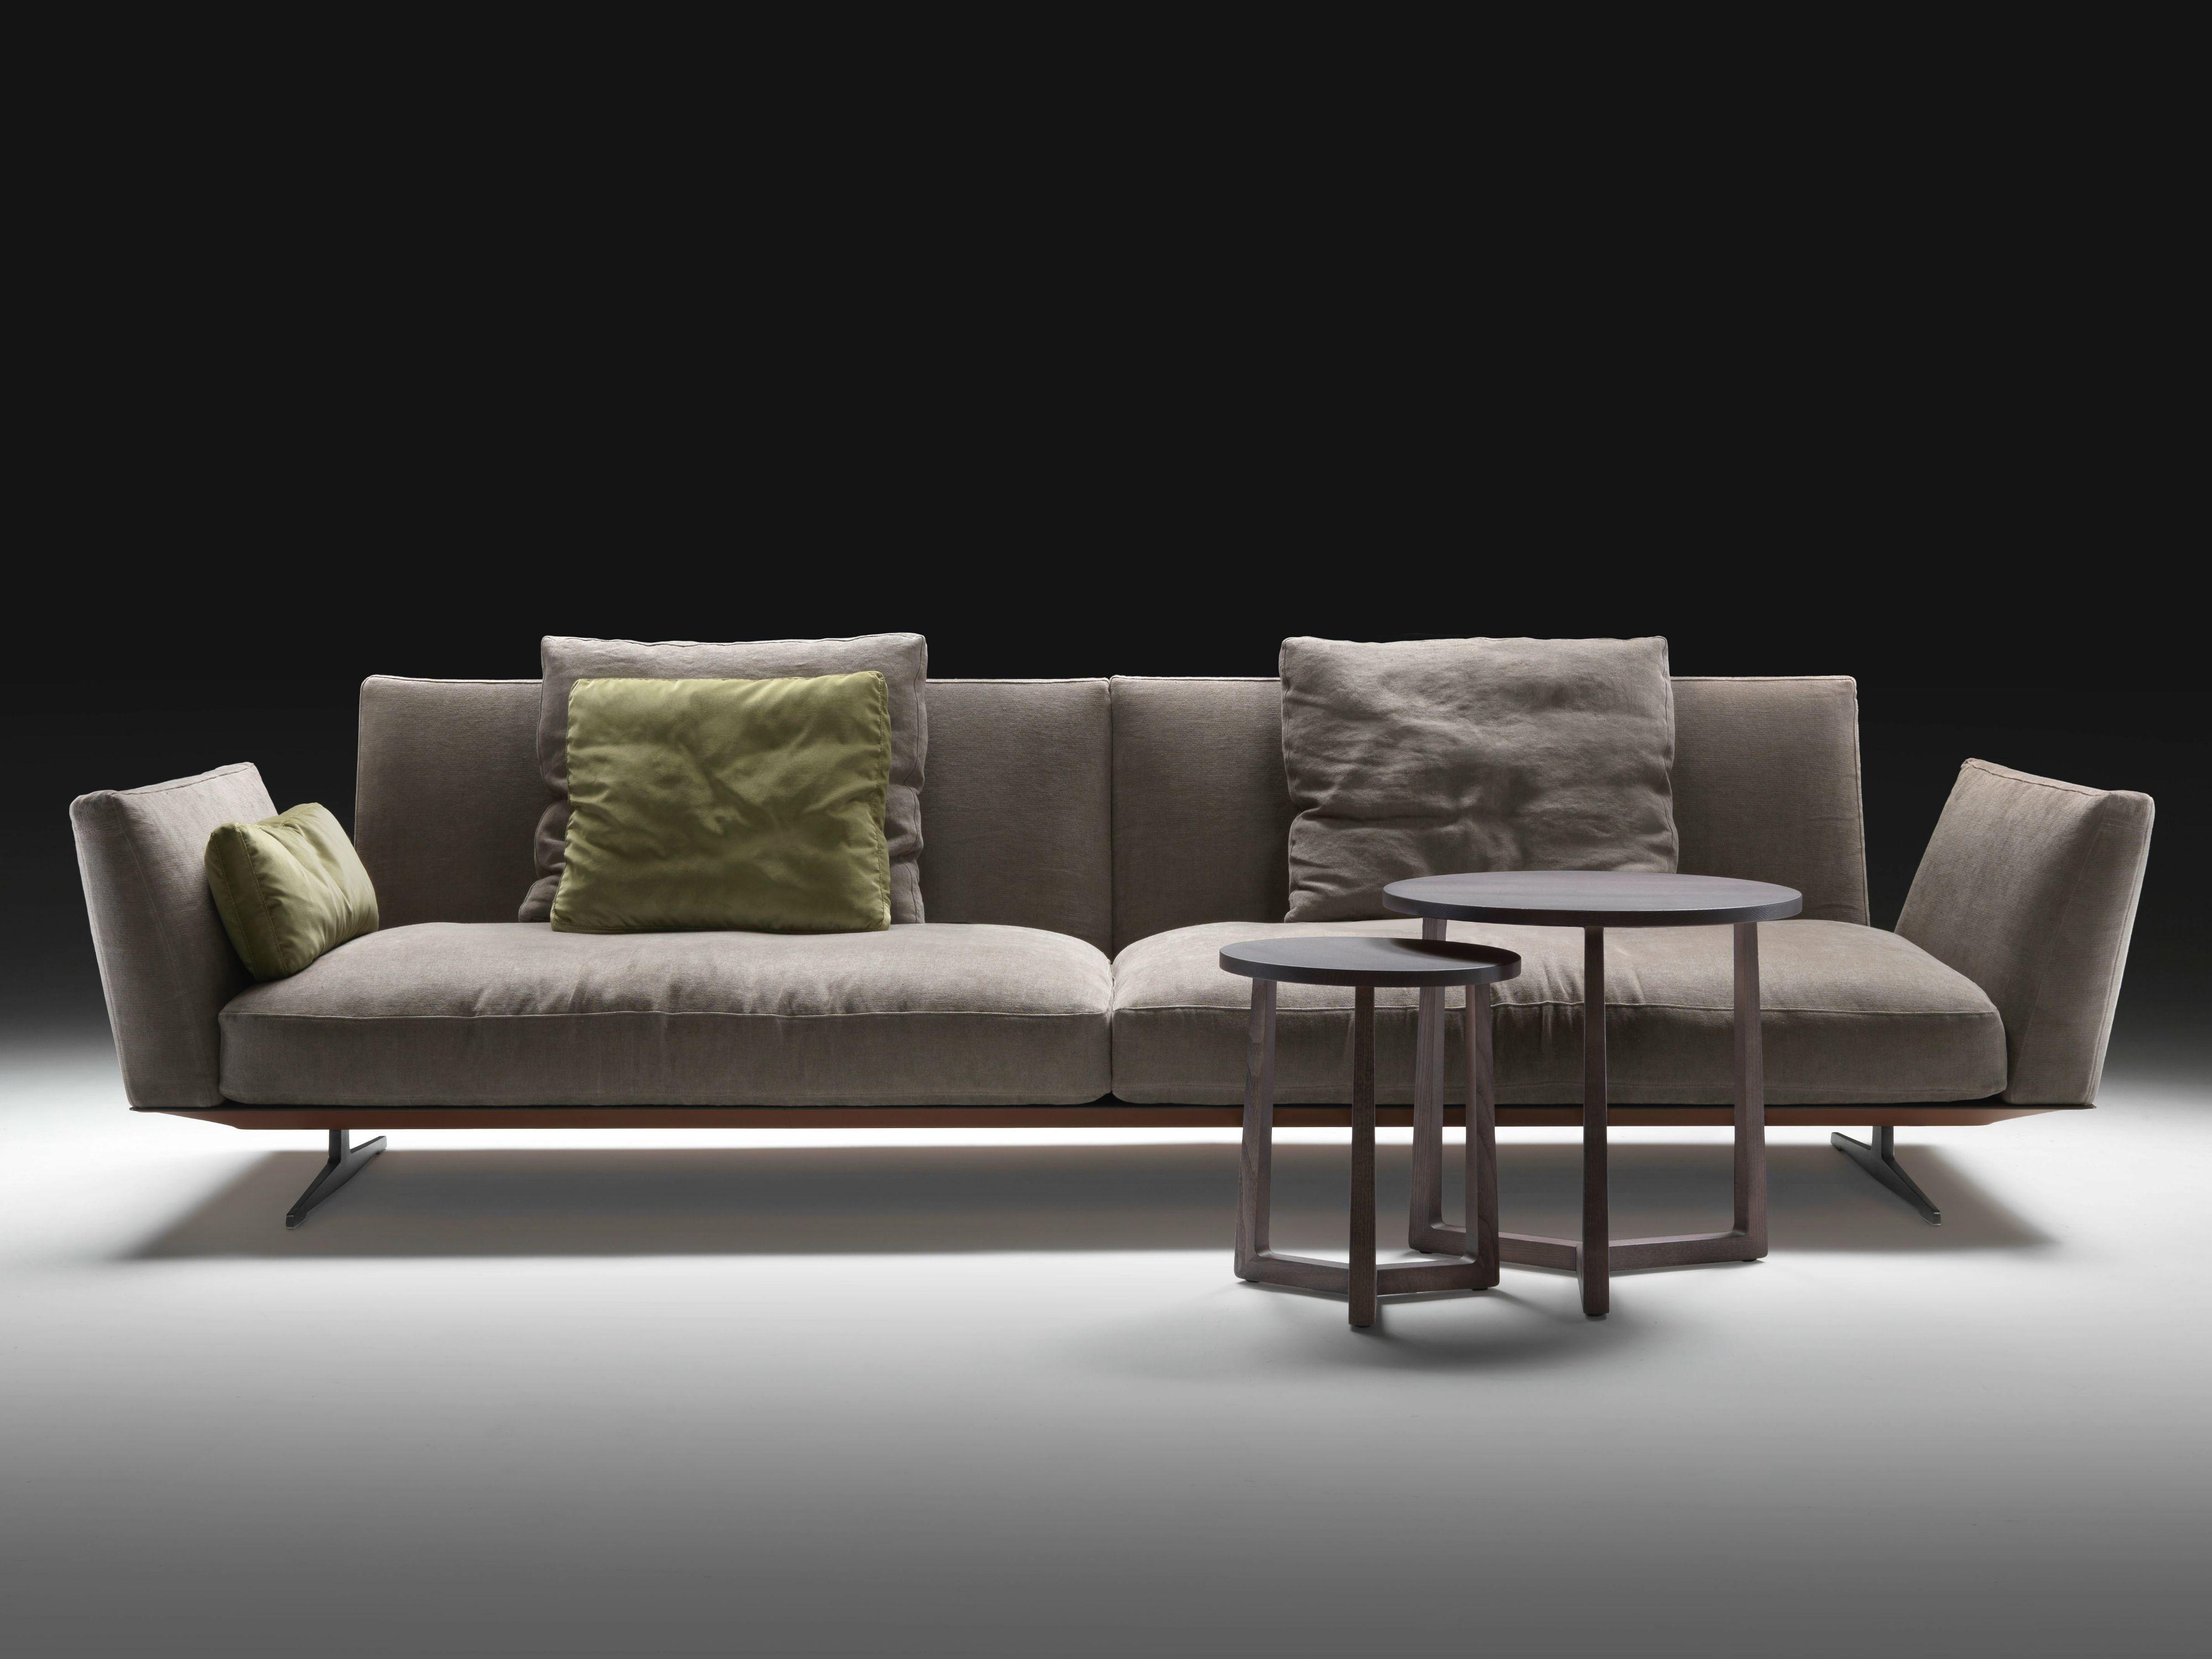 EVERGREEN Sofá by FLEXFORM diseño Antonio Citterio | furniture: the ...